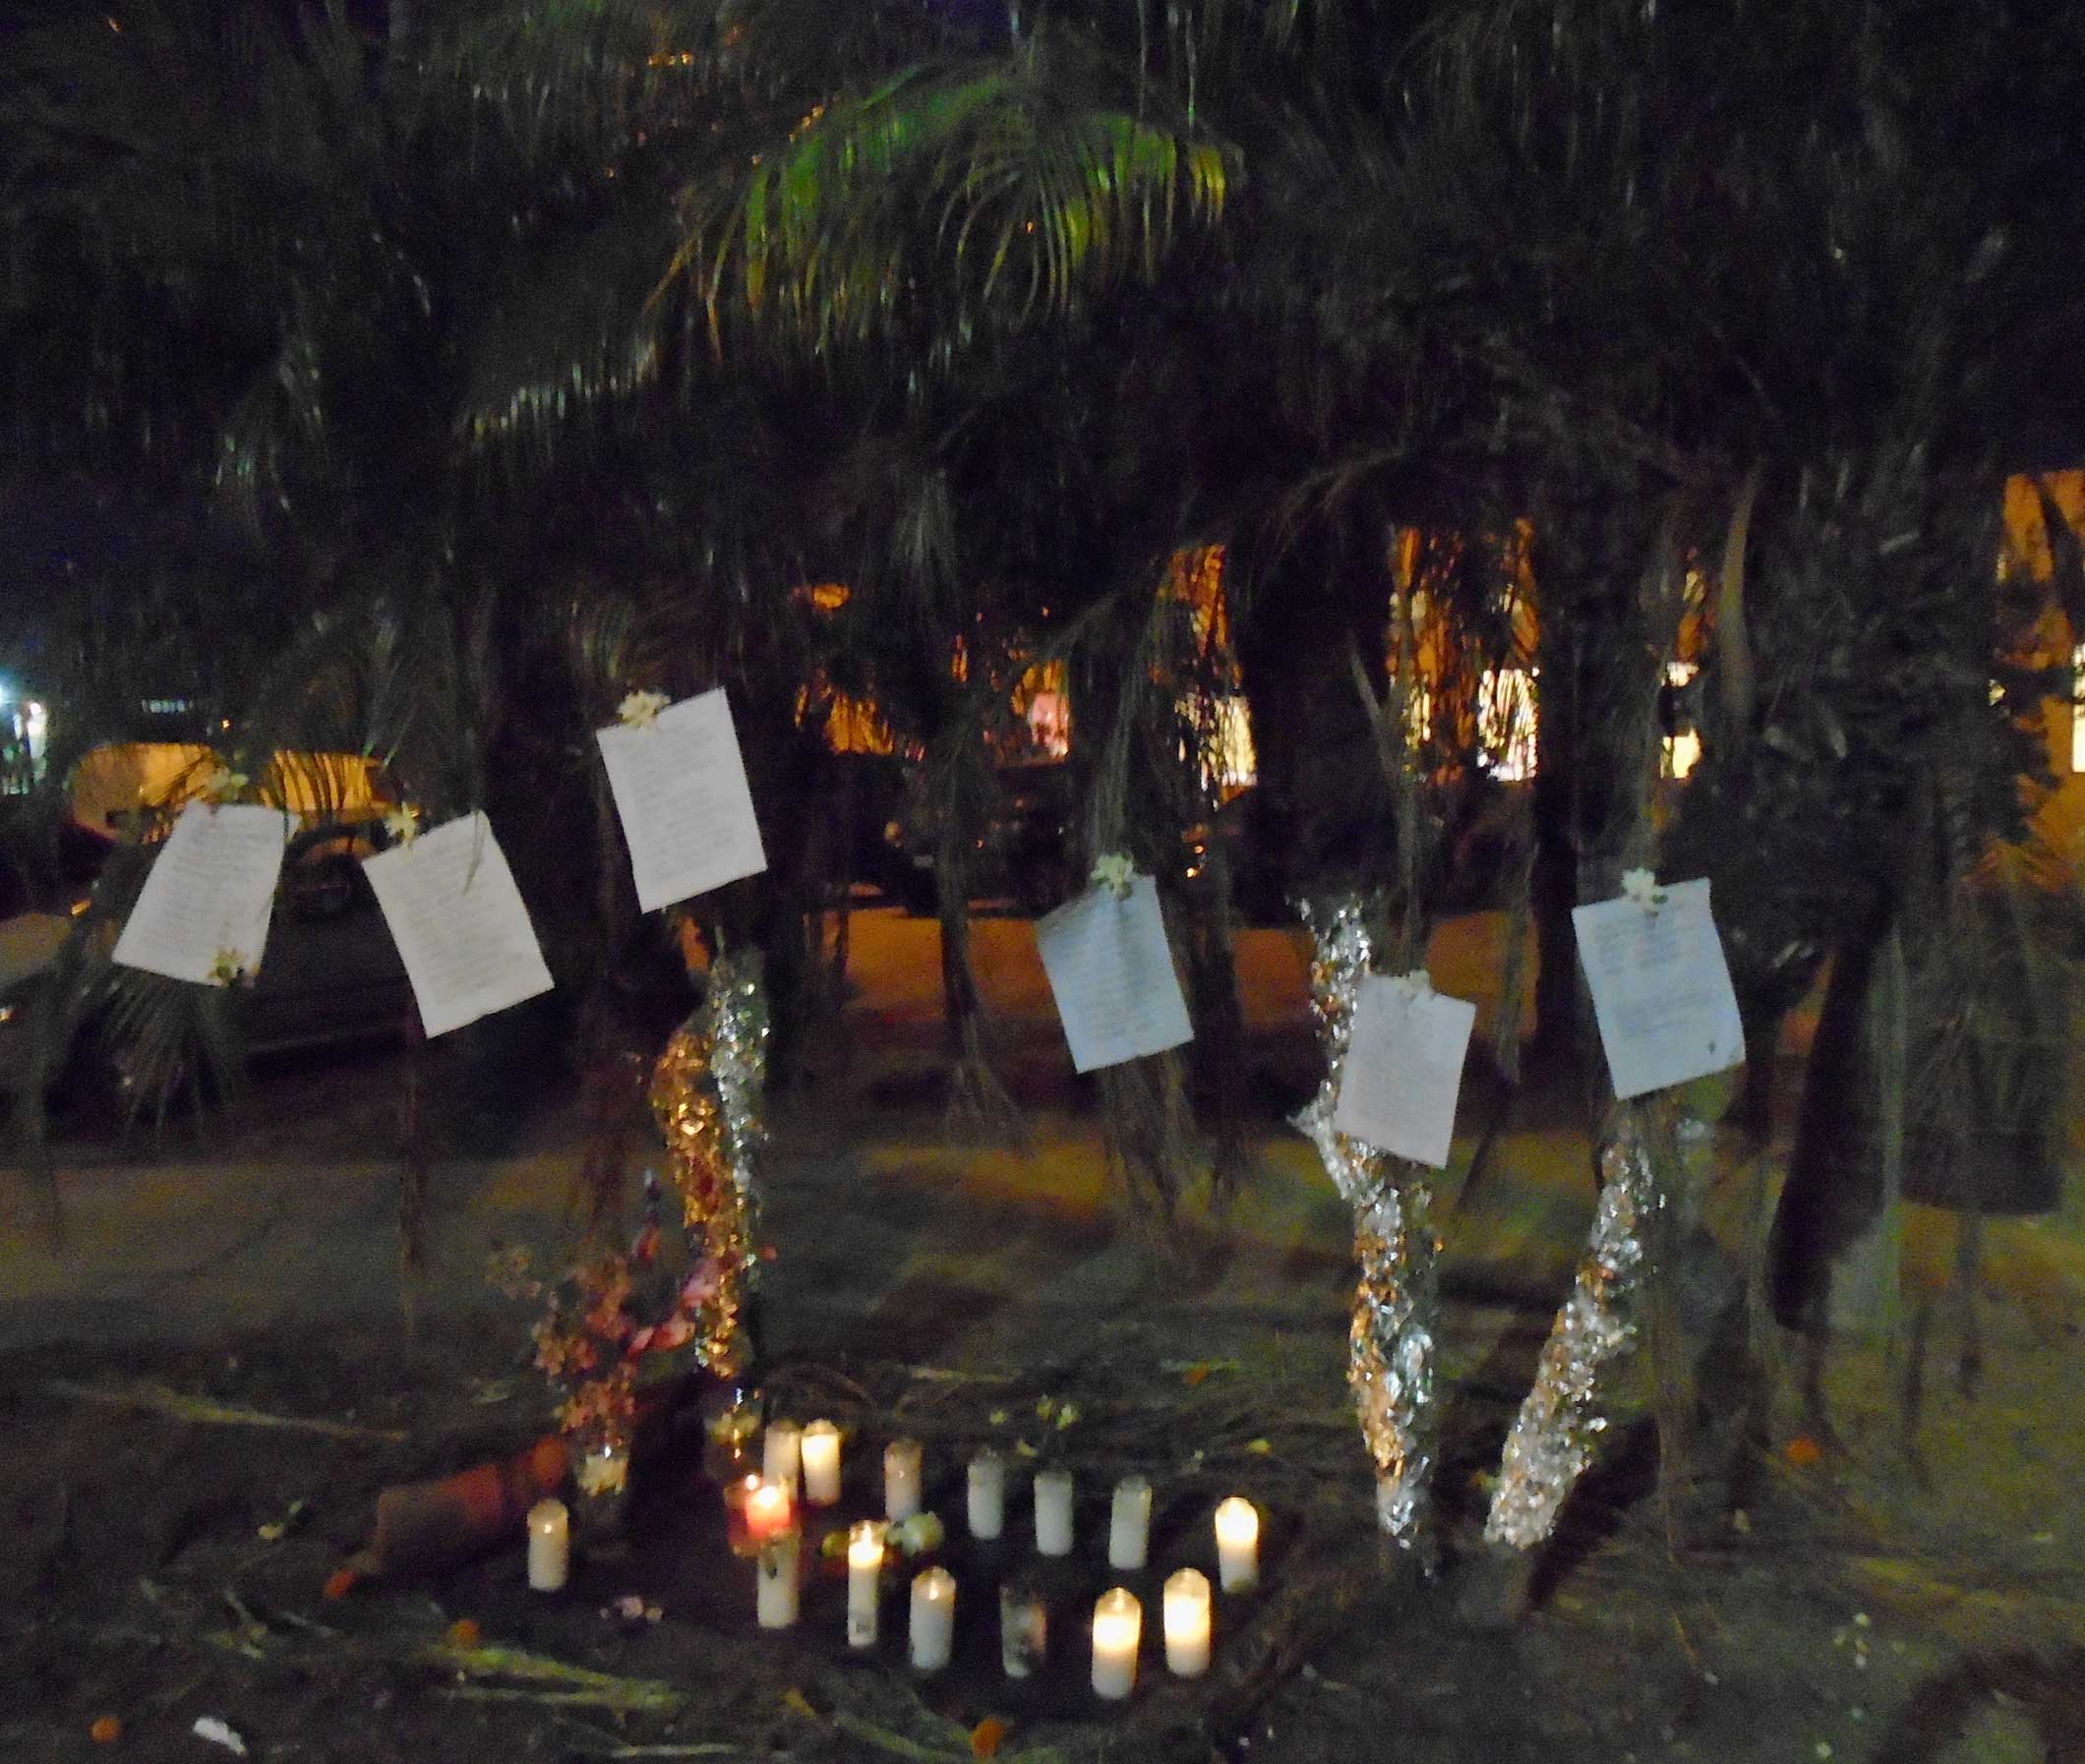 El Velorio – Remembering the dead